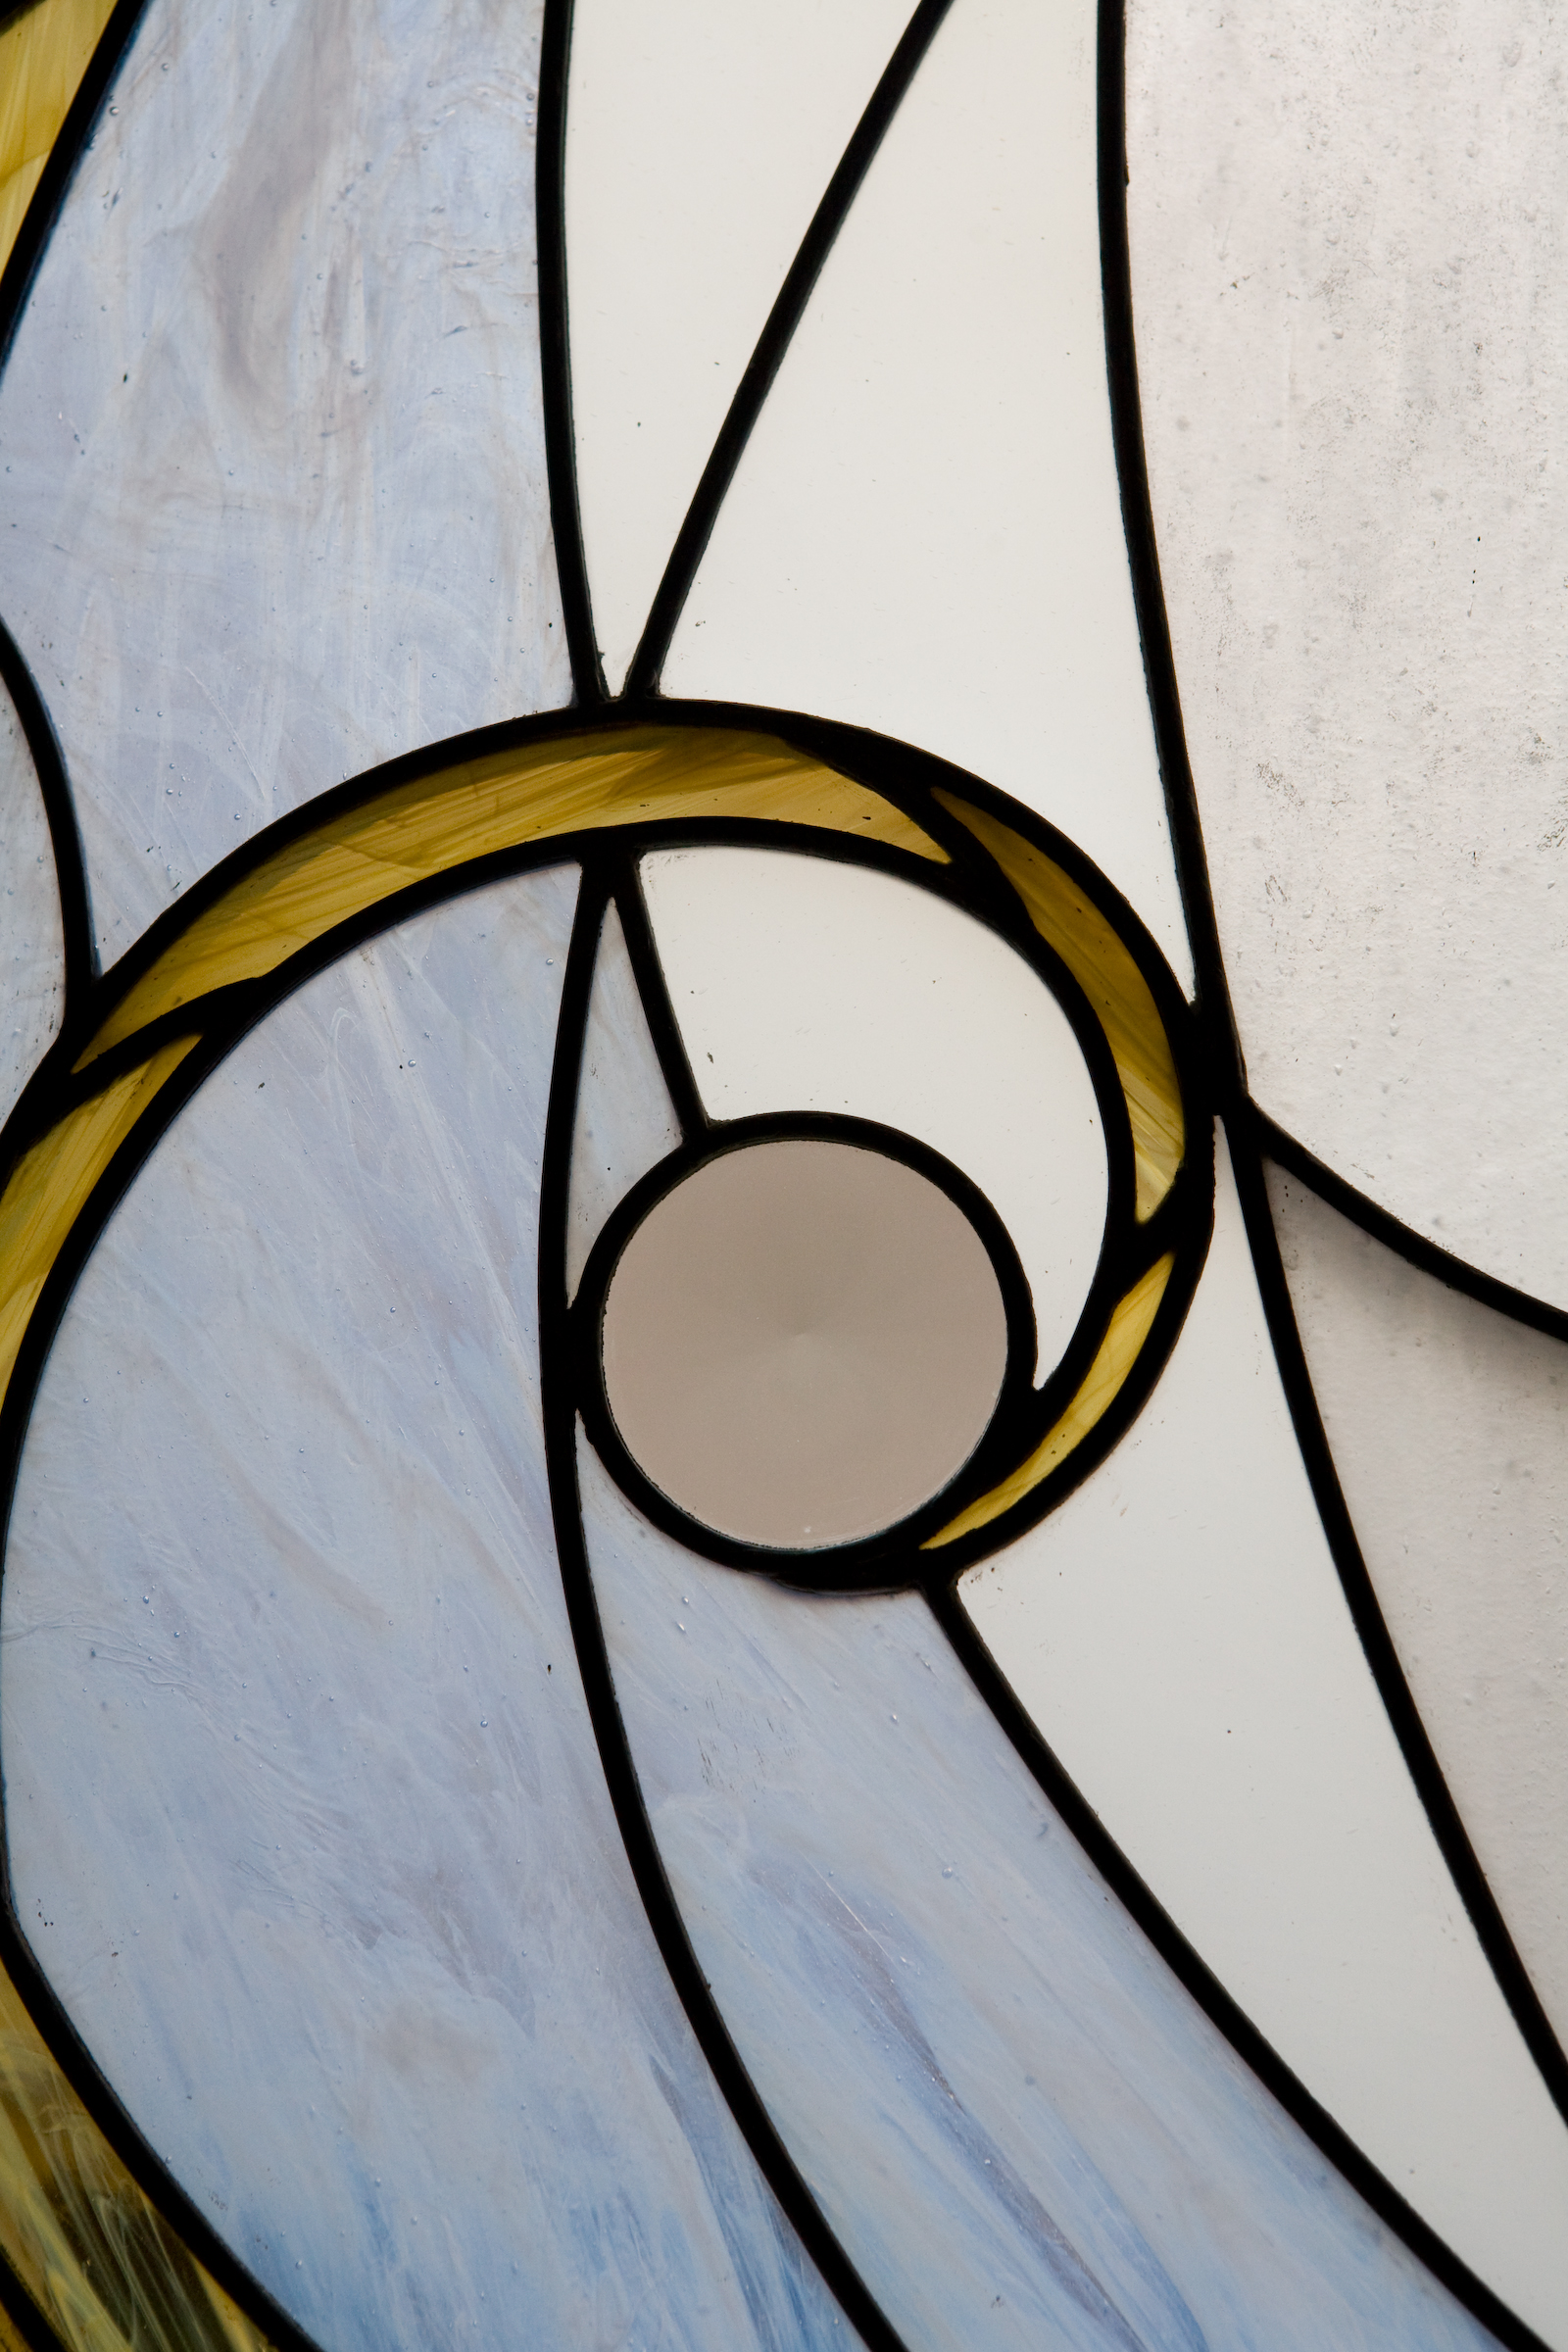 mosaic, detail, elegant, beautiful, light, glass, window